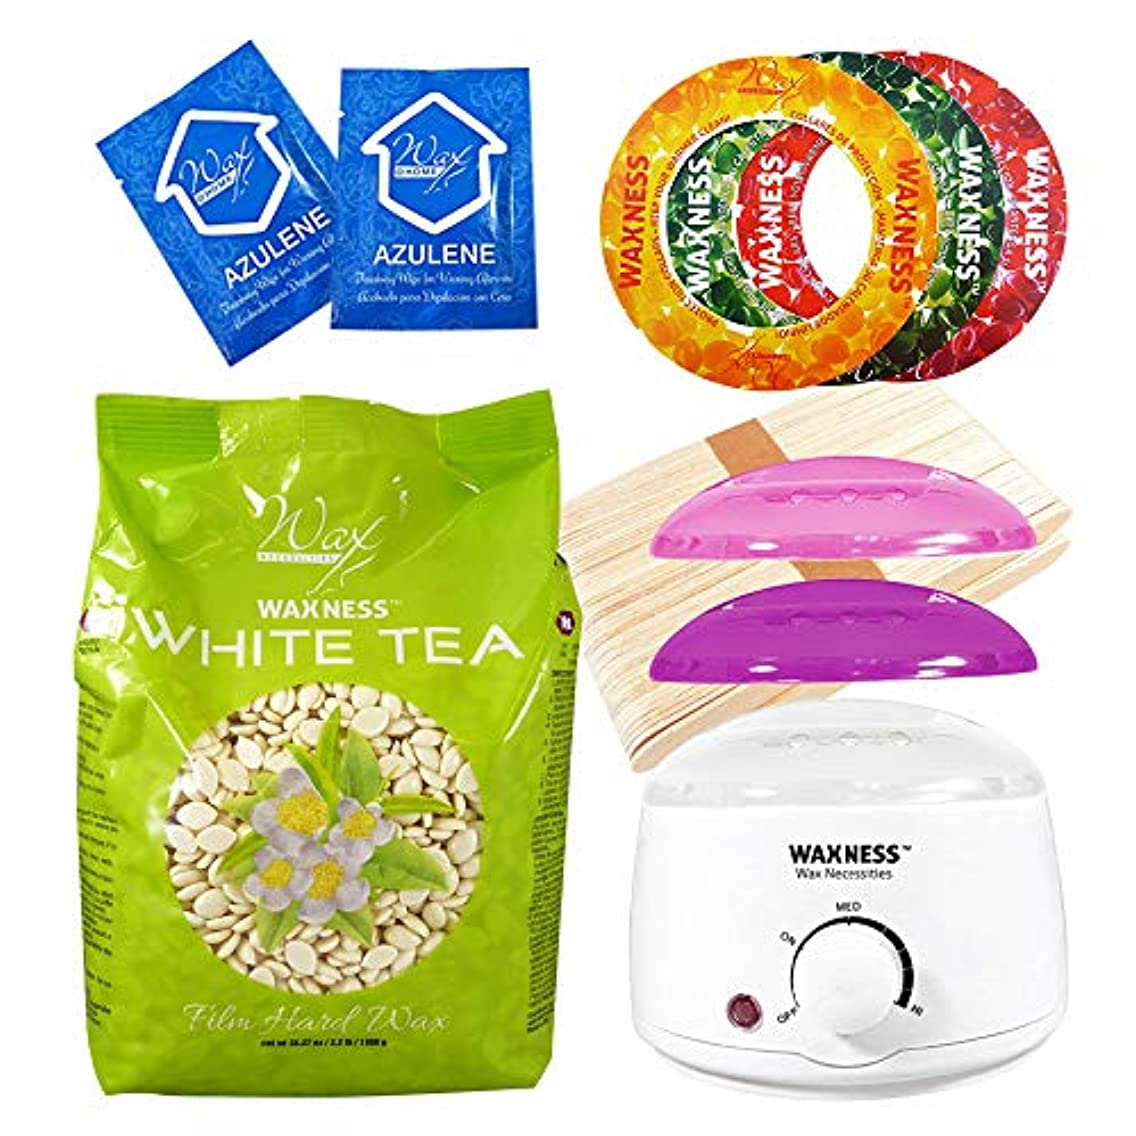 Wax Necessities Waxness White Tea Cream Stripless Waxing Kit with 35.27 oz / 1 kg Wax Bag